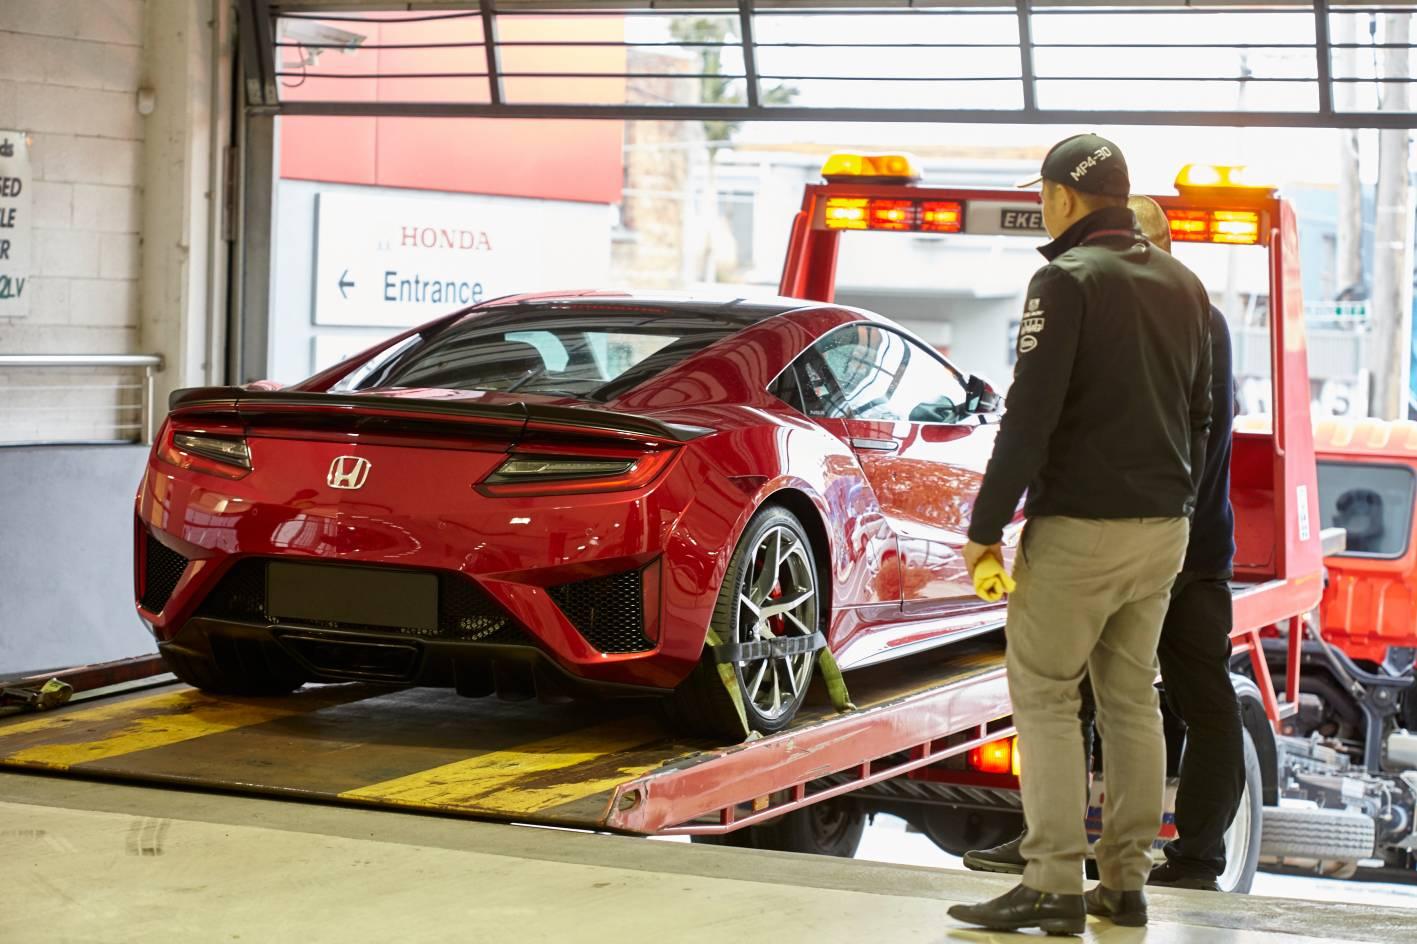 All New Honda Nsx Rolls Into Australian Showroom Forcegt Com